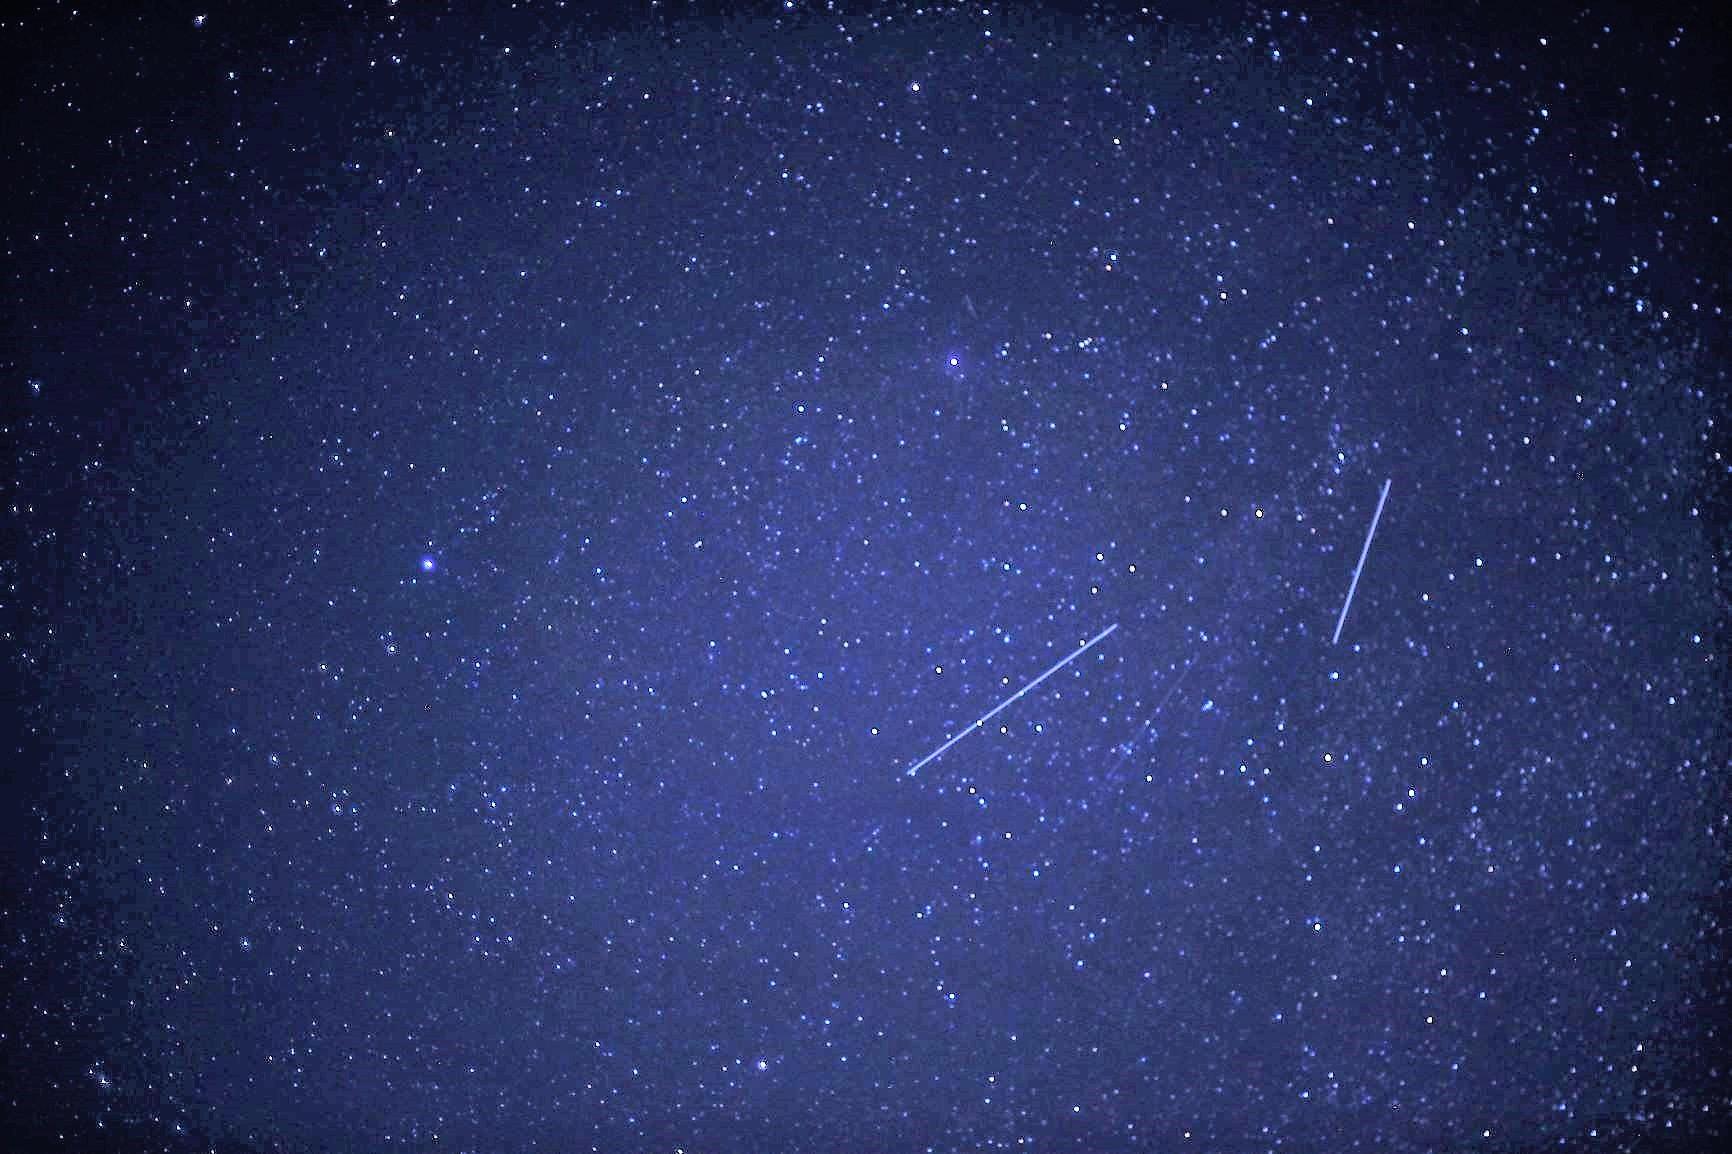 夏休みの自由研究2020 星空観察③_d0155147_10310372.jpg